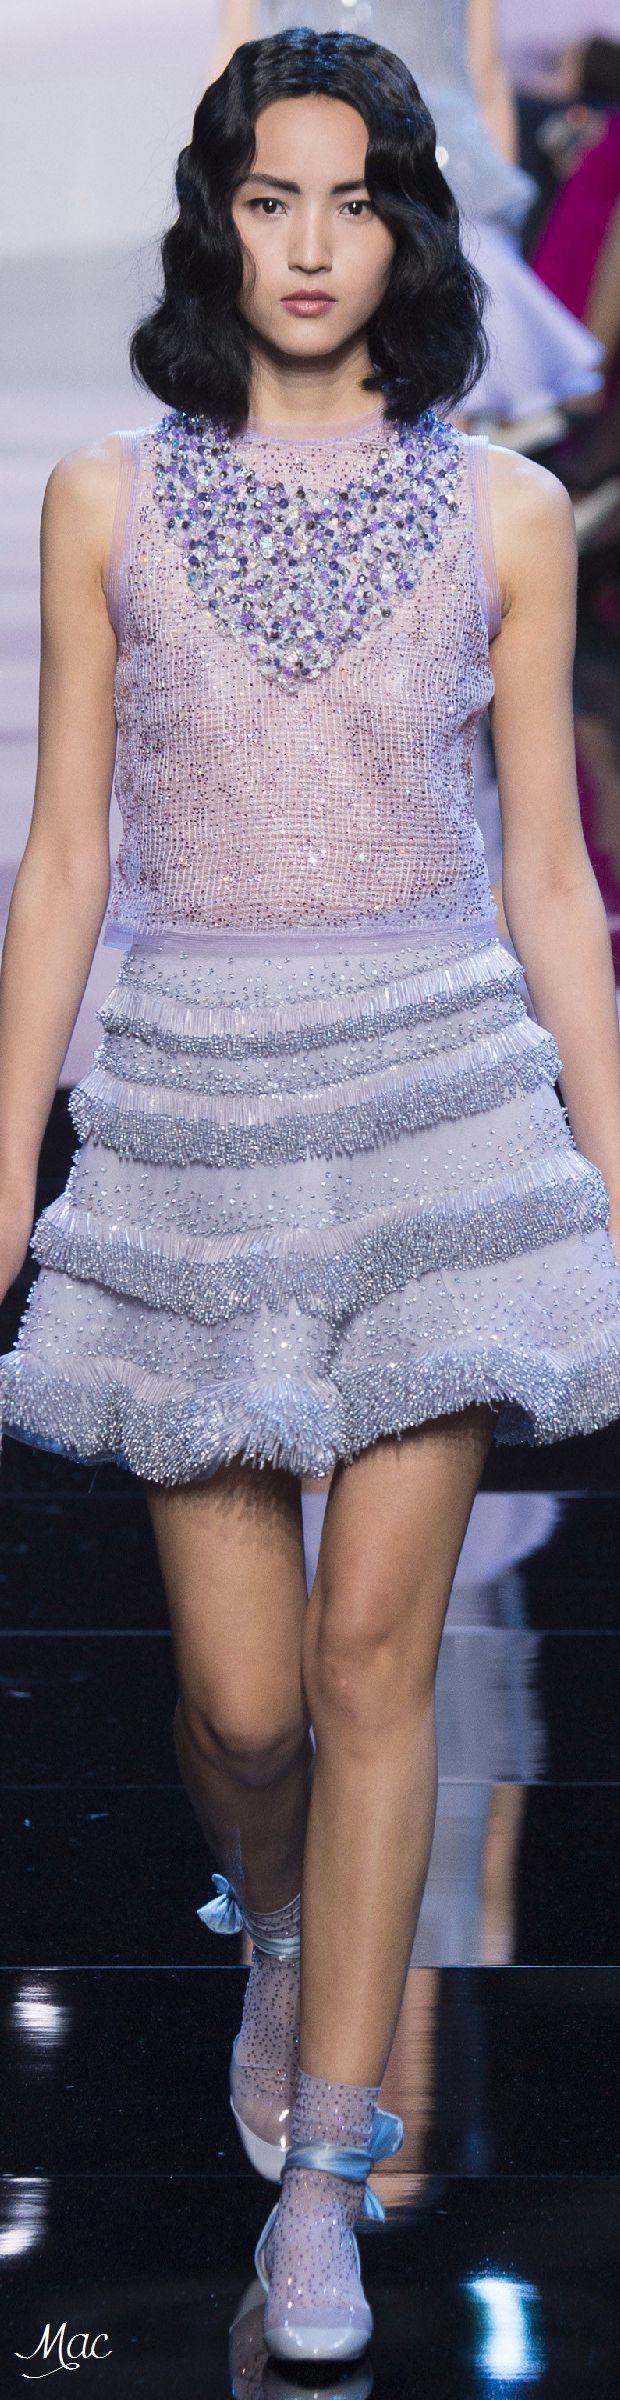 www.2locos.com Spring 2016 Haute Couture Armani Privé ✏✏✏✏✏✏✏✏✏✏✏✏✏✏✏✏  FʀᴇɴᴄʜJᴇᴡᴇʟʀʏVɪɴᴛᴀɢᴇ   ☞ https://www.etsy.com/shop/frenchjewelryvintage?ref=l2-shopheader-name ══════════════════════  Gᴀʙʏ﹣Fᴇ́ᴇʀɪᴇ Jᴇᴡᴇʟʀʏ ☞ https://www.alittlemarket.com/boutique/gaby_feerie-132444.html ✏✏✏✏✏✏✏✏✏✏✏✏✏✏✏✏